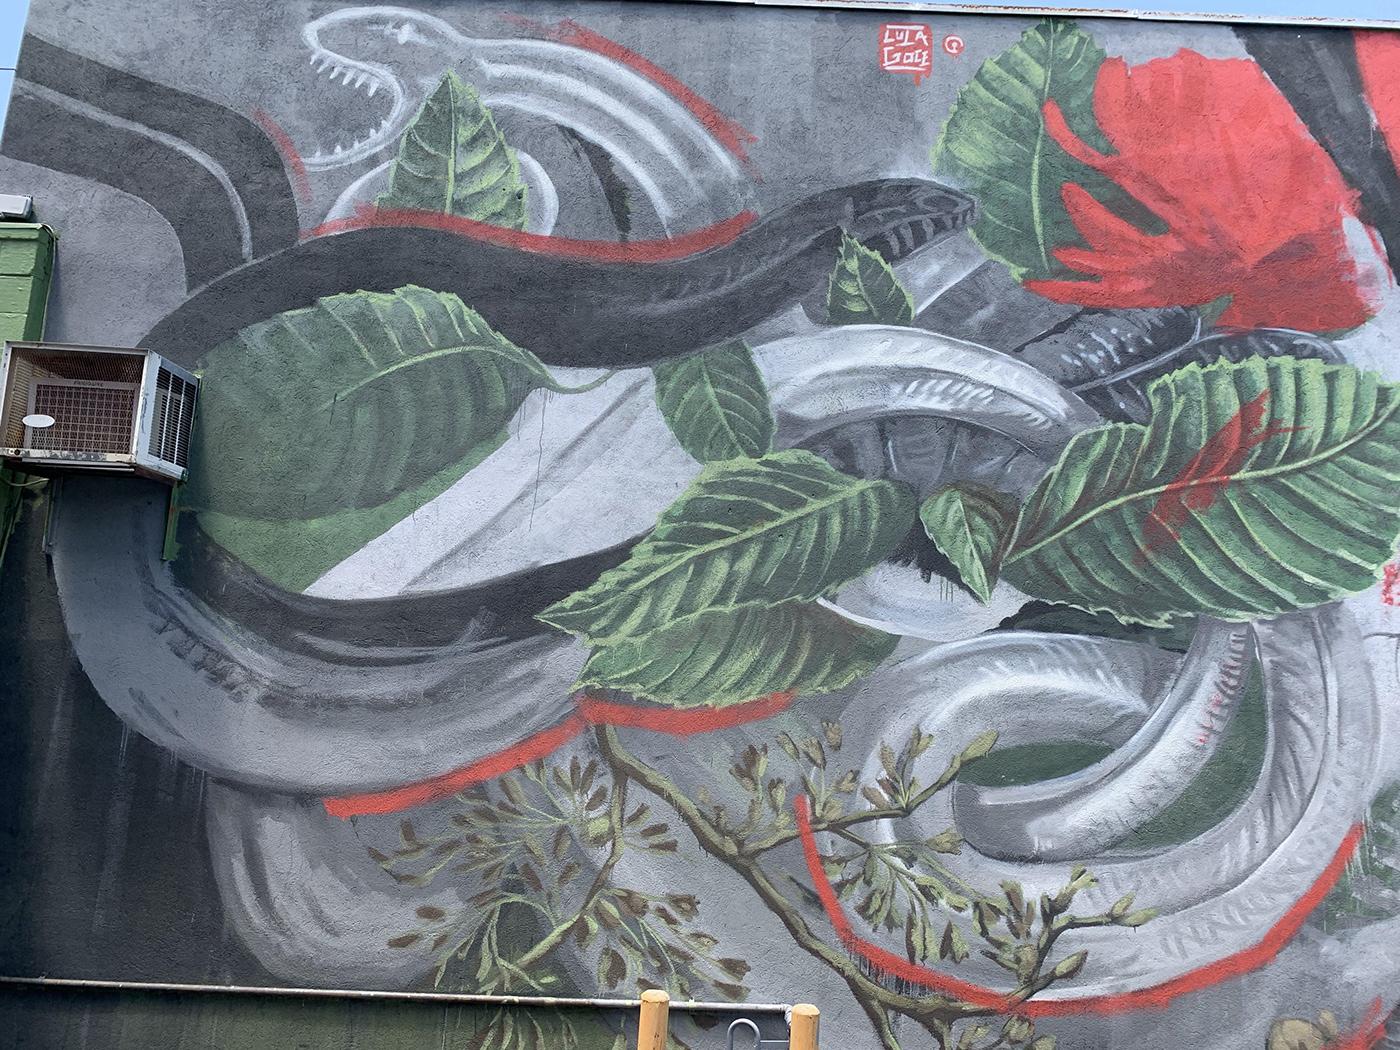 arte urbano FINEART Illustrator Lula Goce Mural painting   streetart urban art